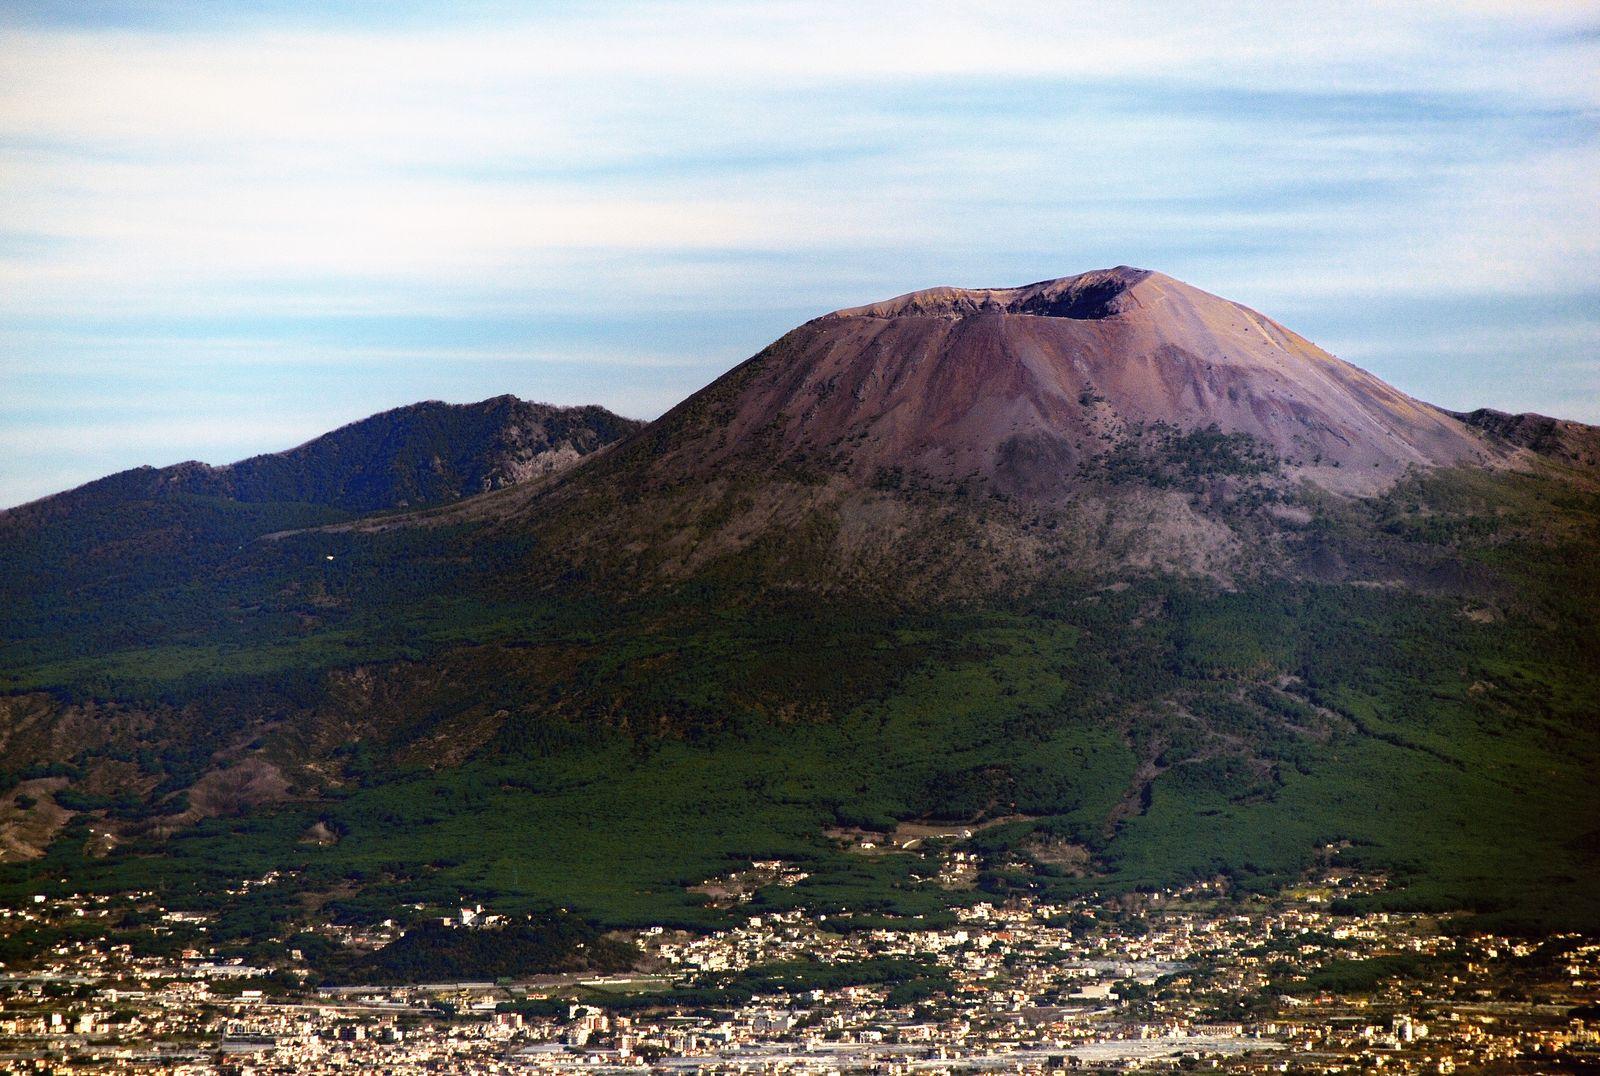 Mt. Vesuvius as seen from Sorrento